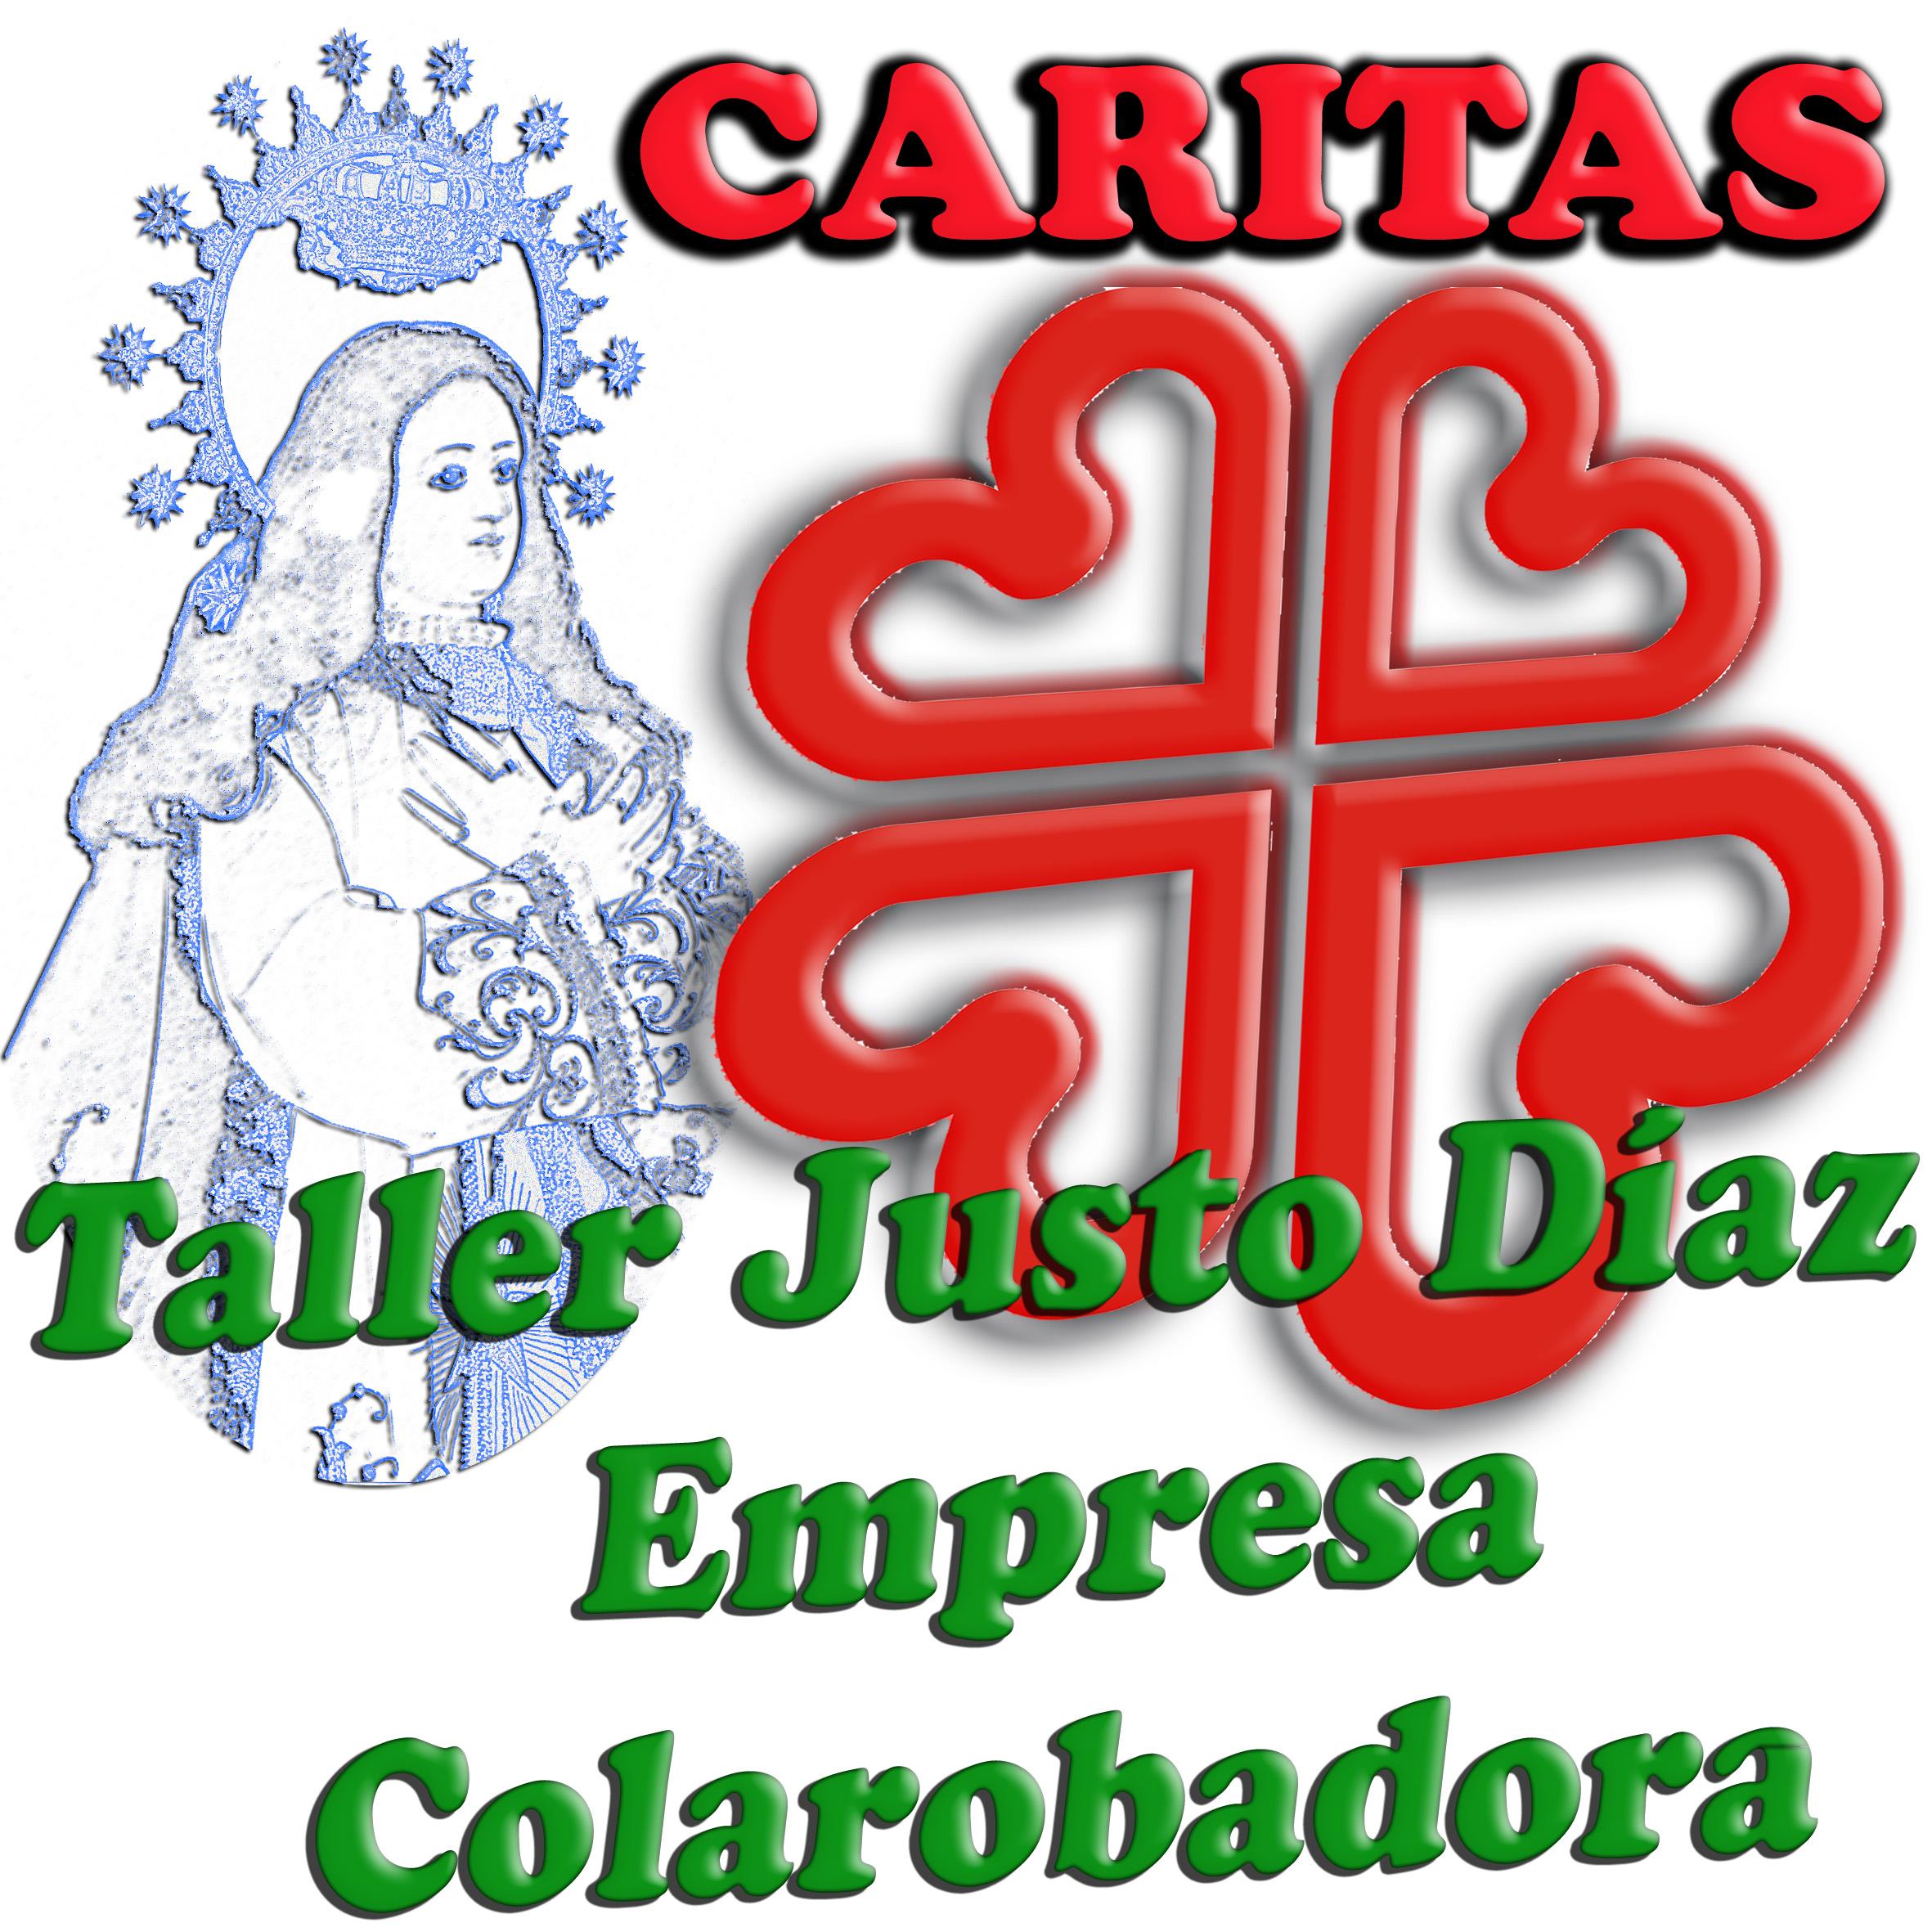 Cáritas de Torrejoncillo empieza a construir 'empresas con corazón'.